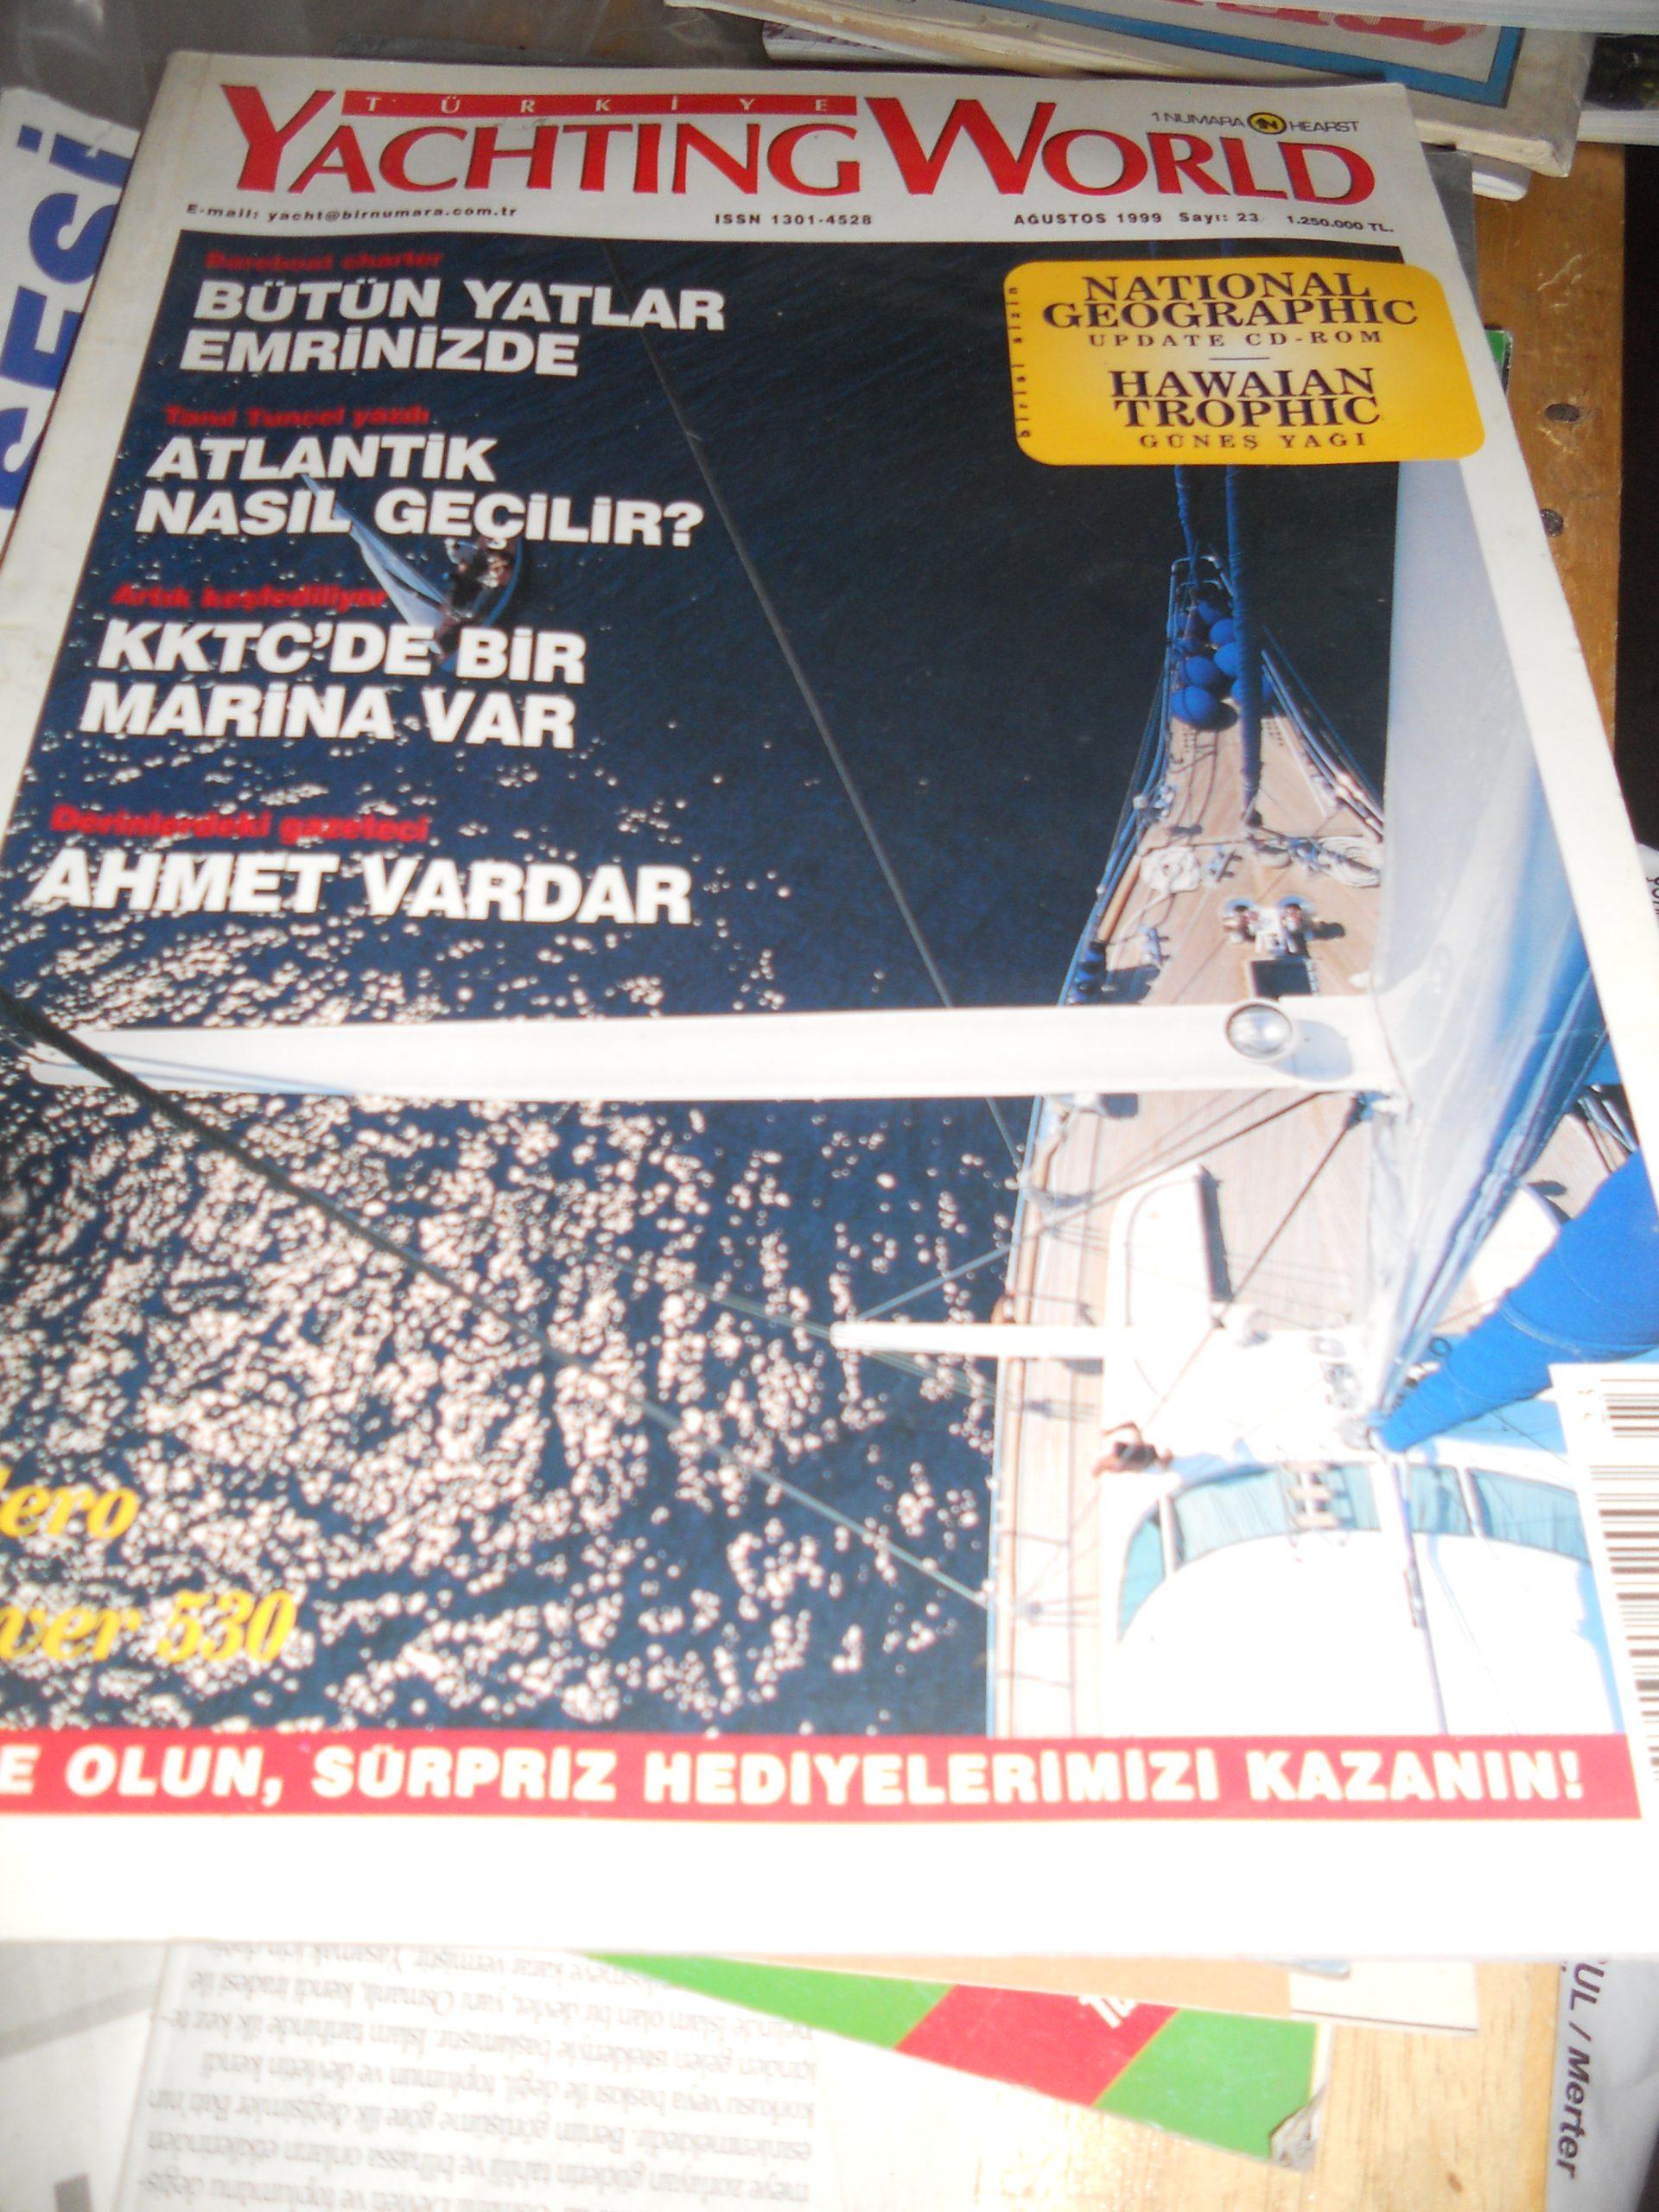 YACHTING WORLD(1999 s 3)/Yat dergisi/ 5 tl